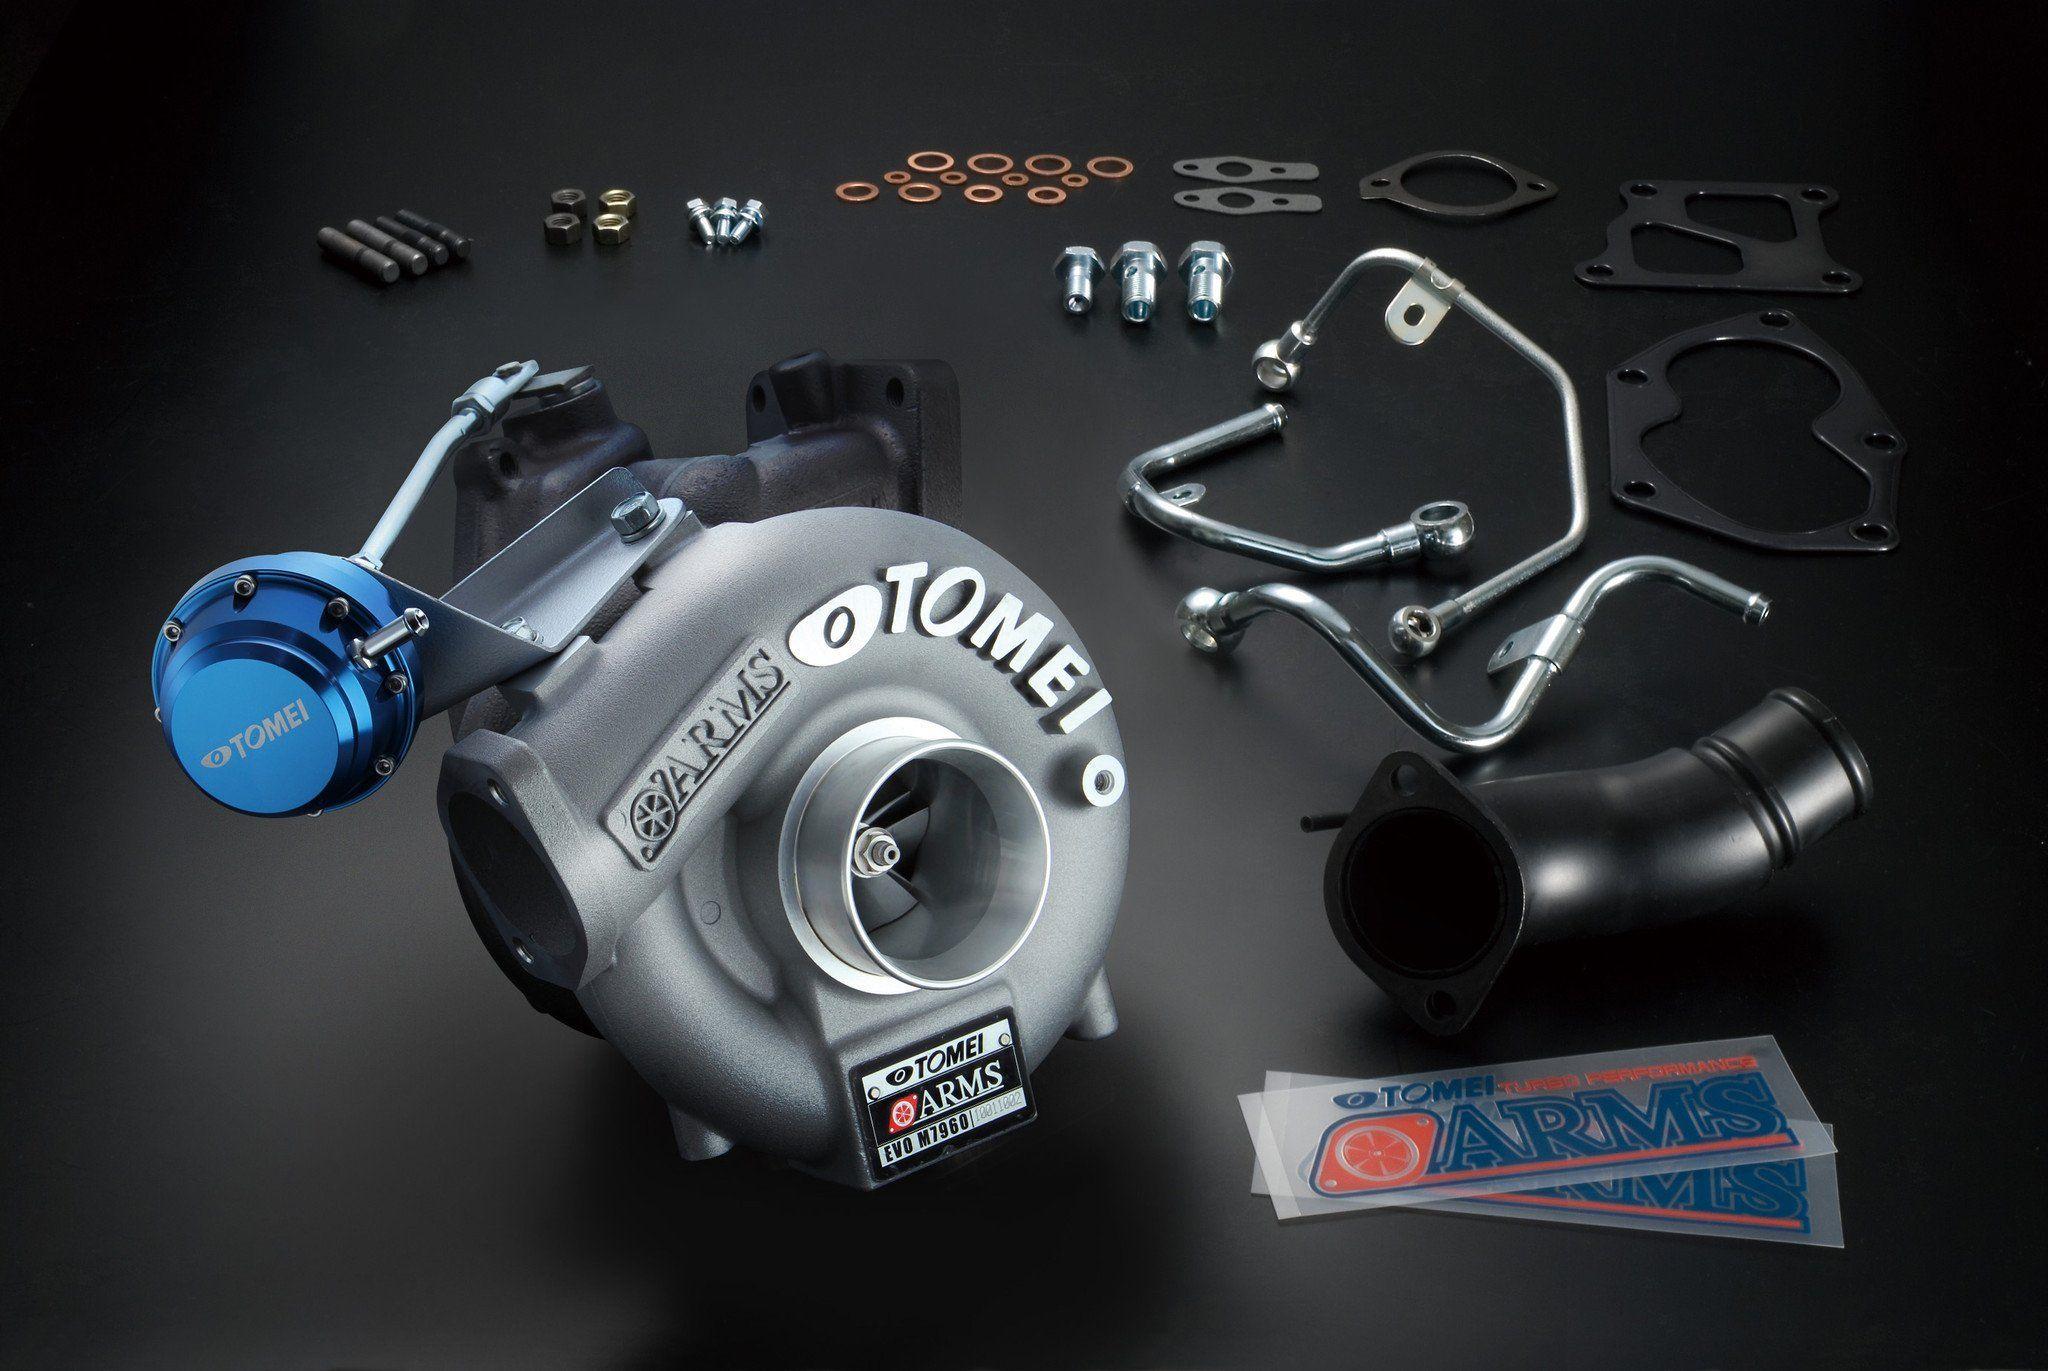 Arms m7960 turbo kit 4g63 evo 4-9 by tomei   Mitsubishi Evolution